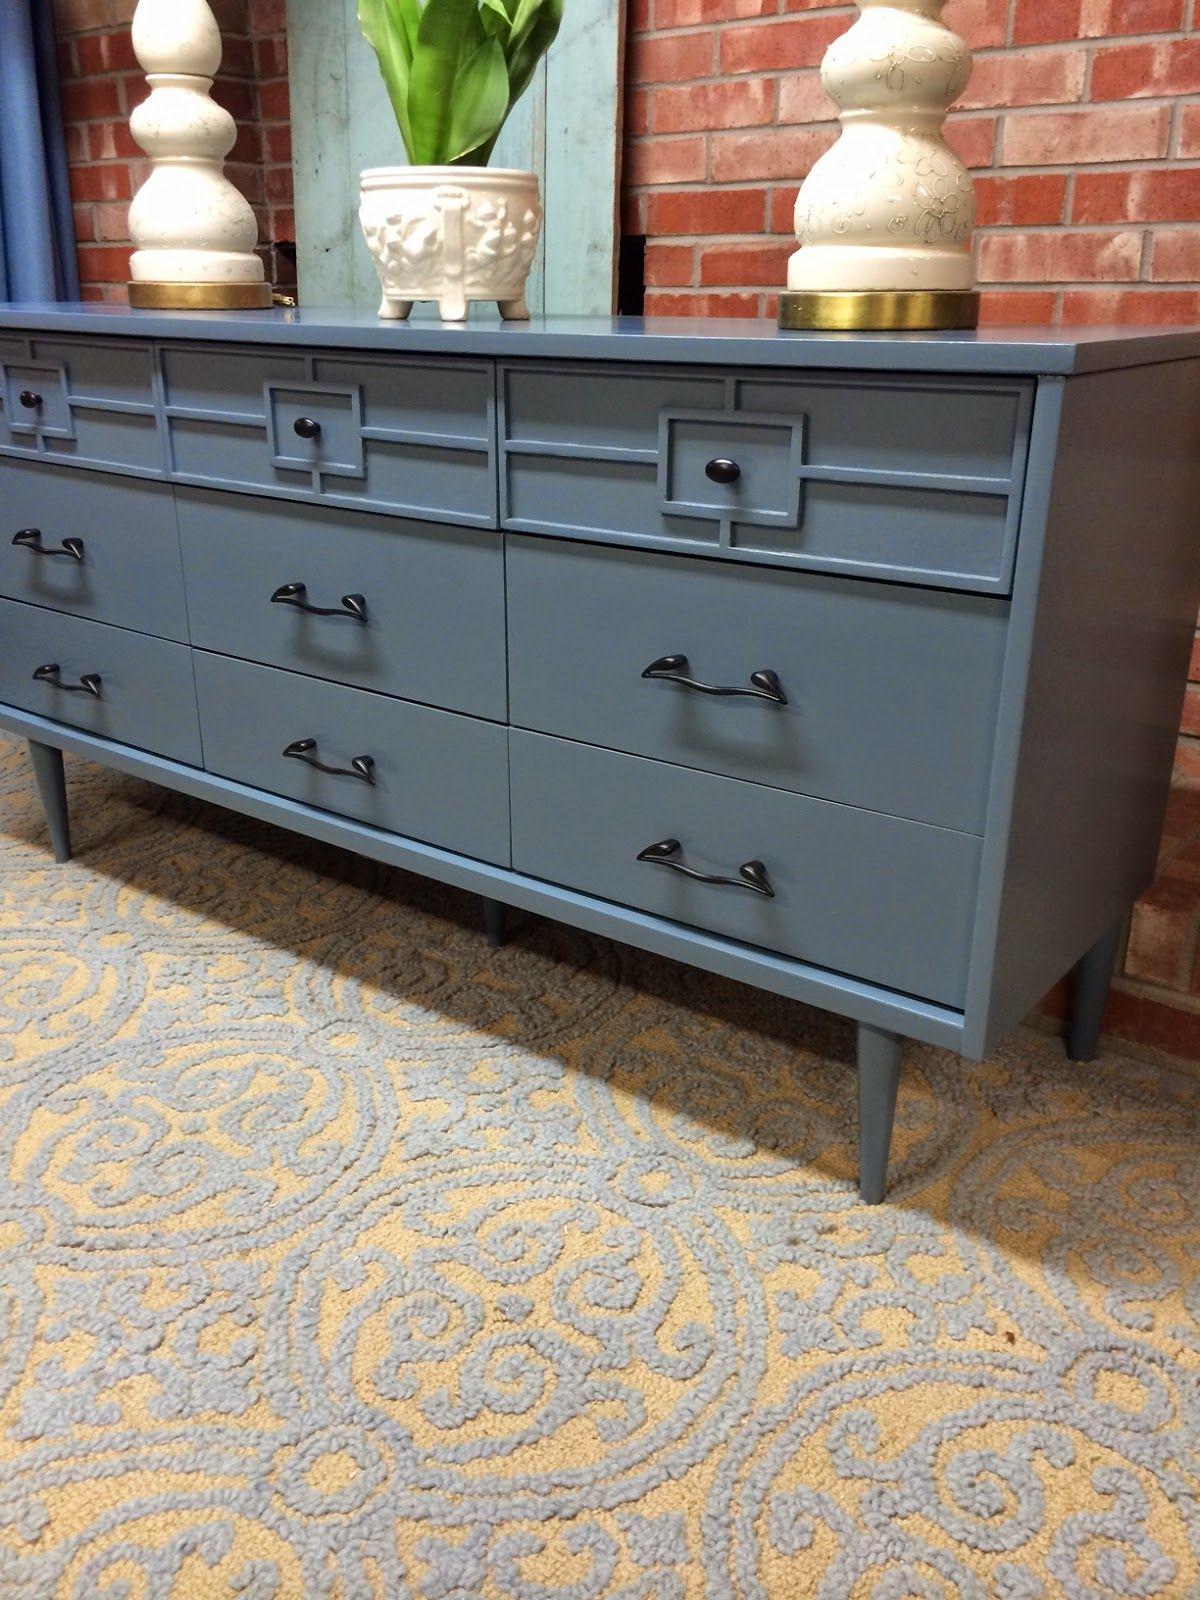 Dresser Painted Blue Dresser With Fretwork Overlay Dresser